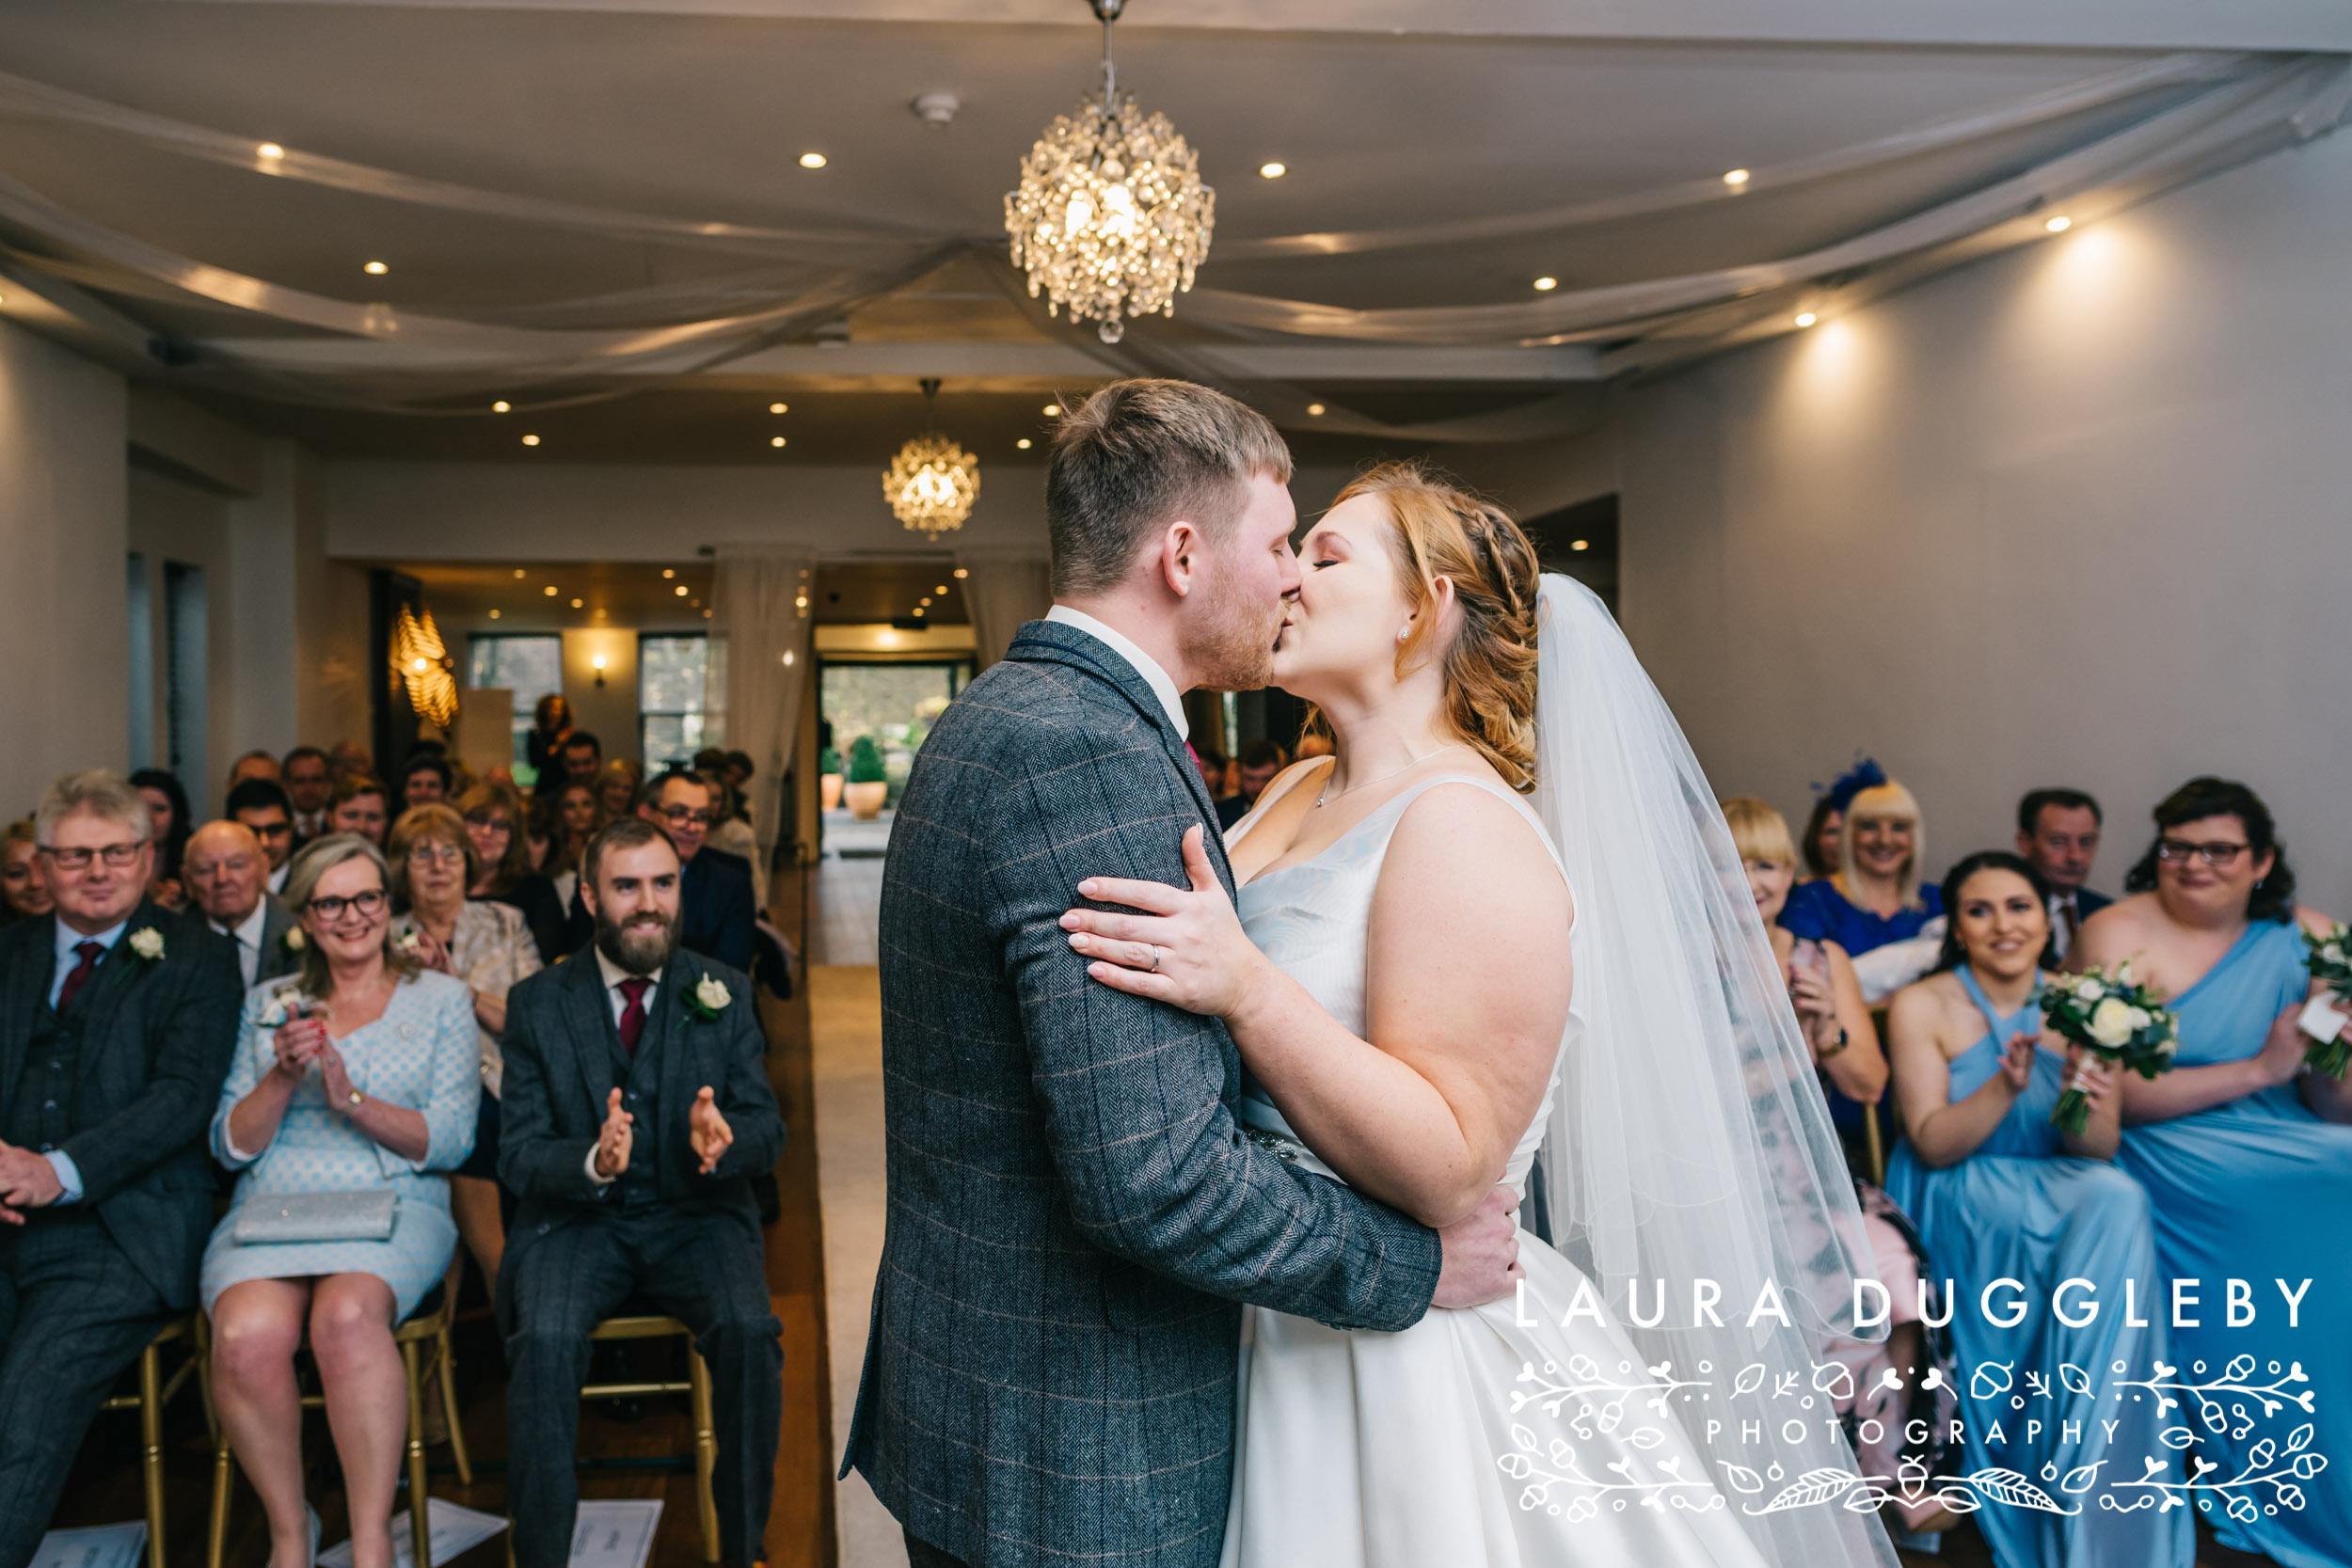 8c29fb713a21 Laura Duggleby Photography - Lancashire Wedding Photographer Blog